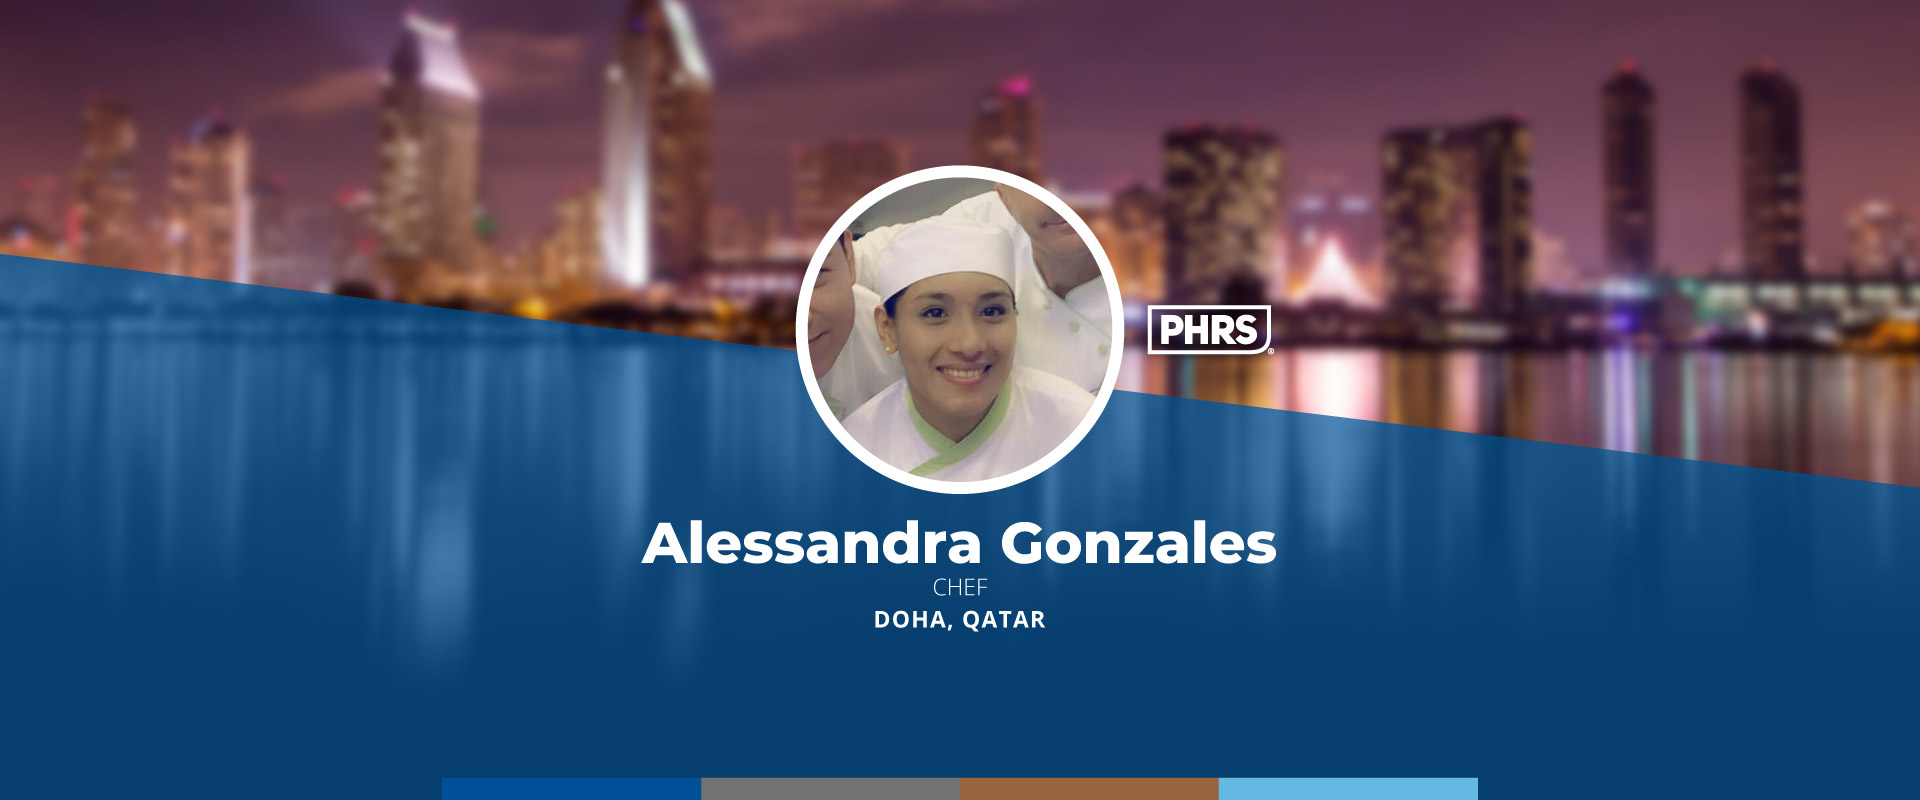 Experiences | Alessandra Gonzales